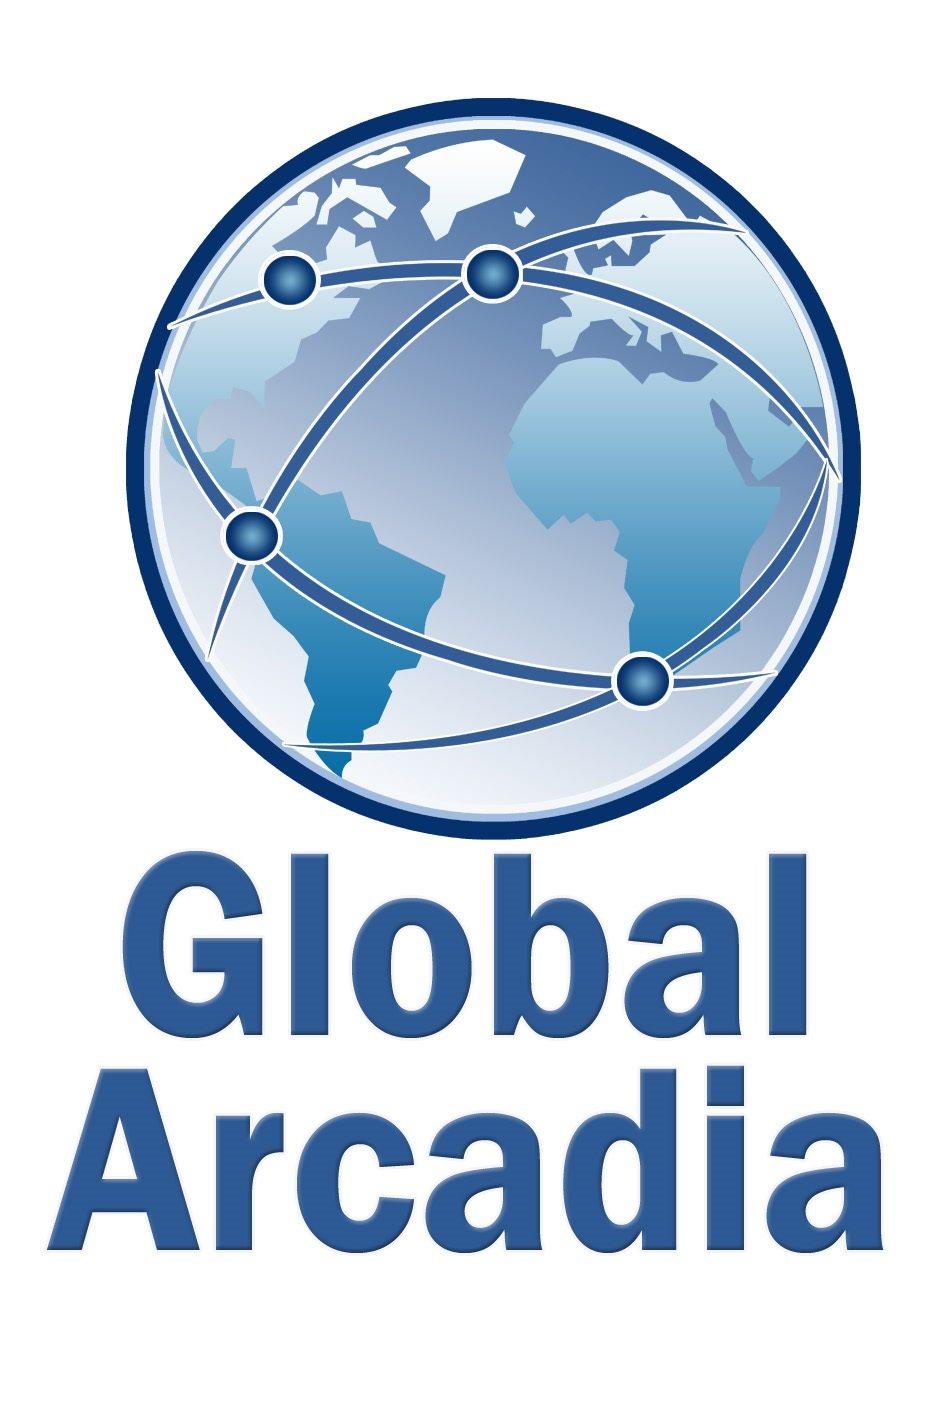 CN GLOBAL Arcadia S.L.